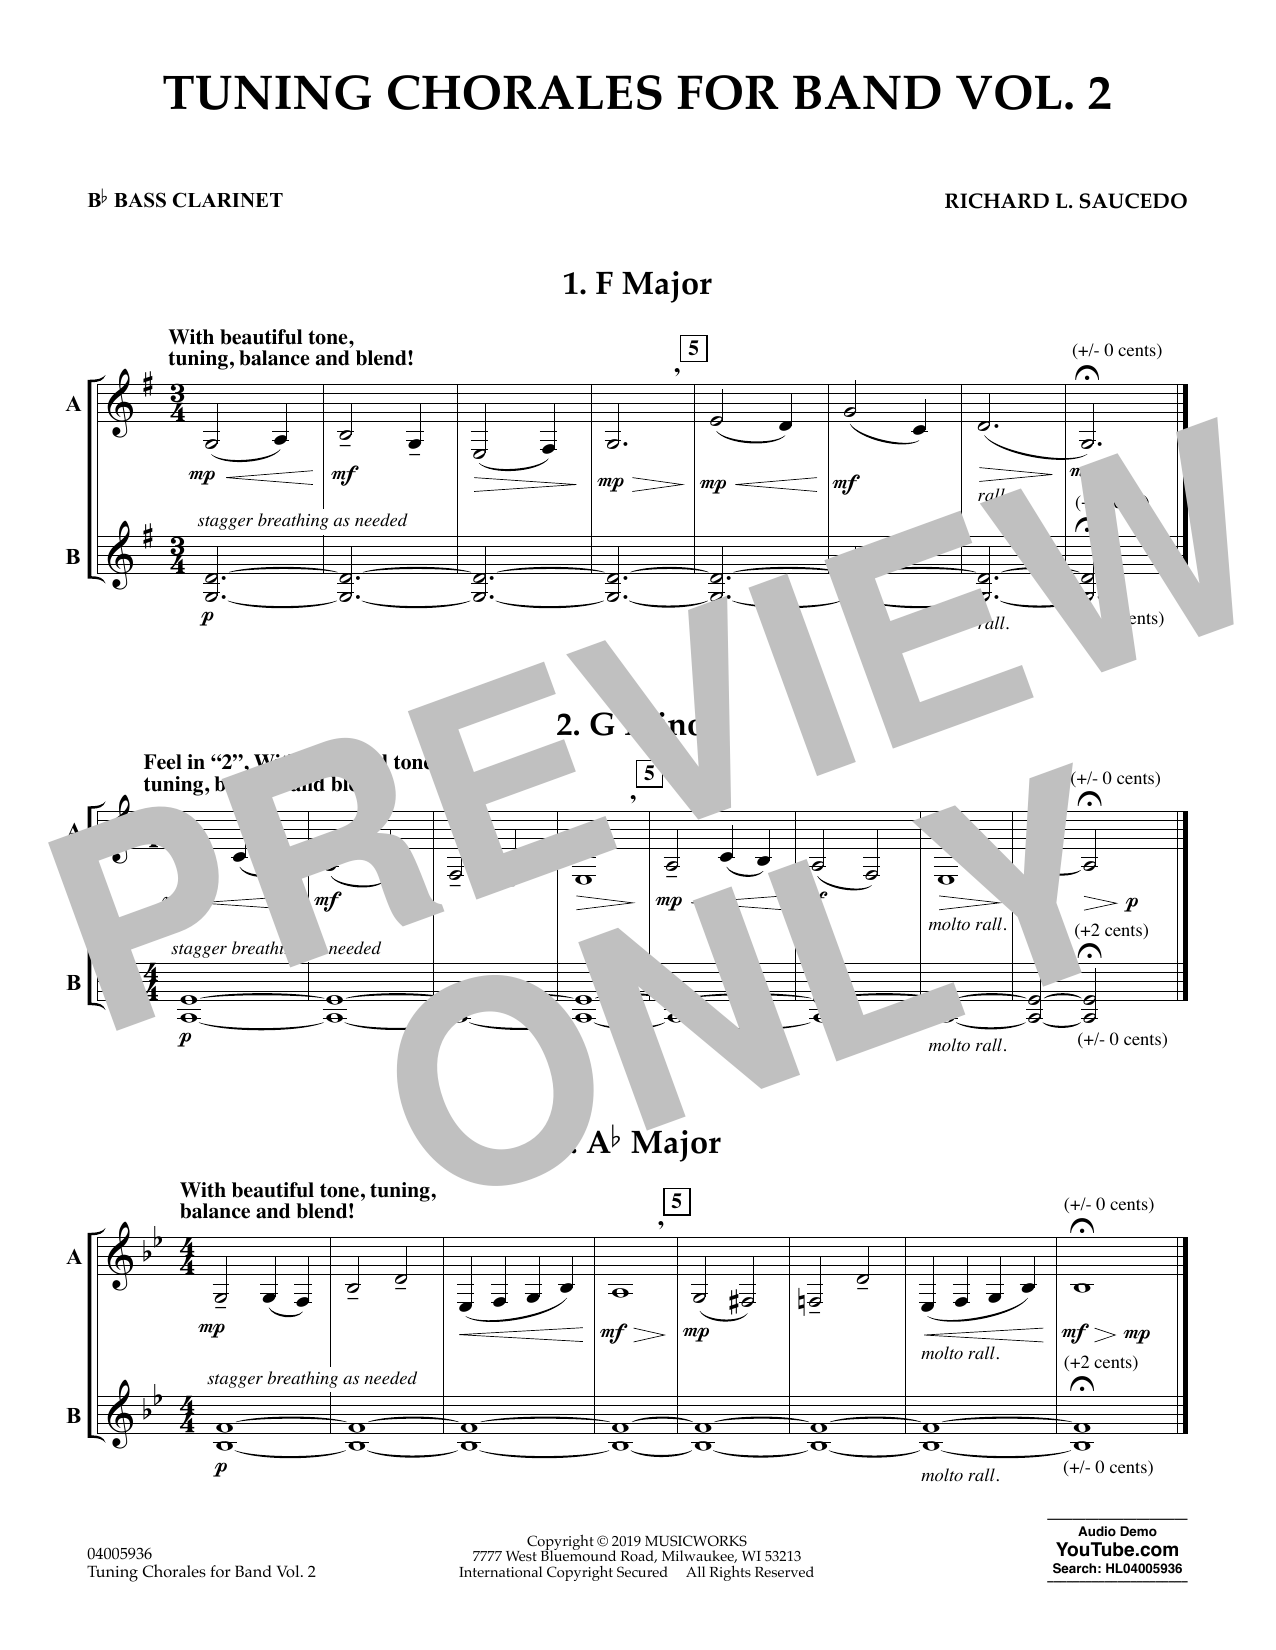 tuning chorales for band, volume 2 - bb bass clarinet sheet music | richard  l. saucedo | concert band  sheet music direct